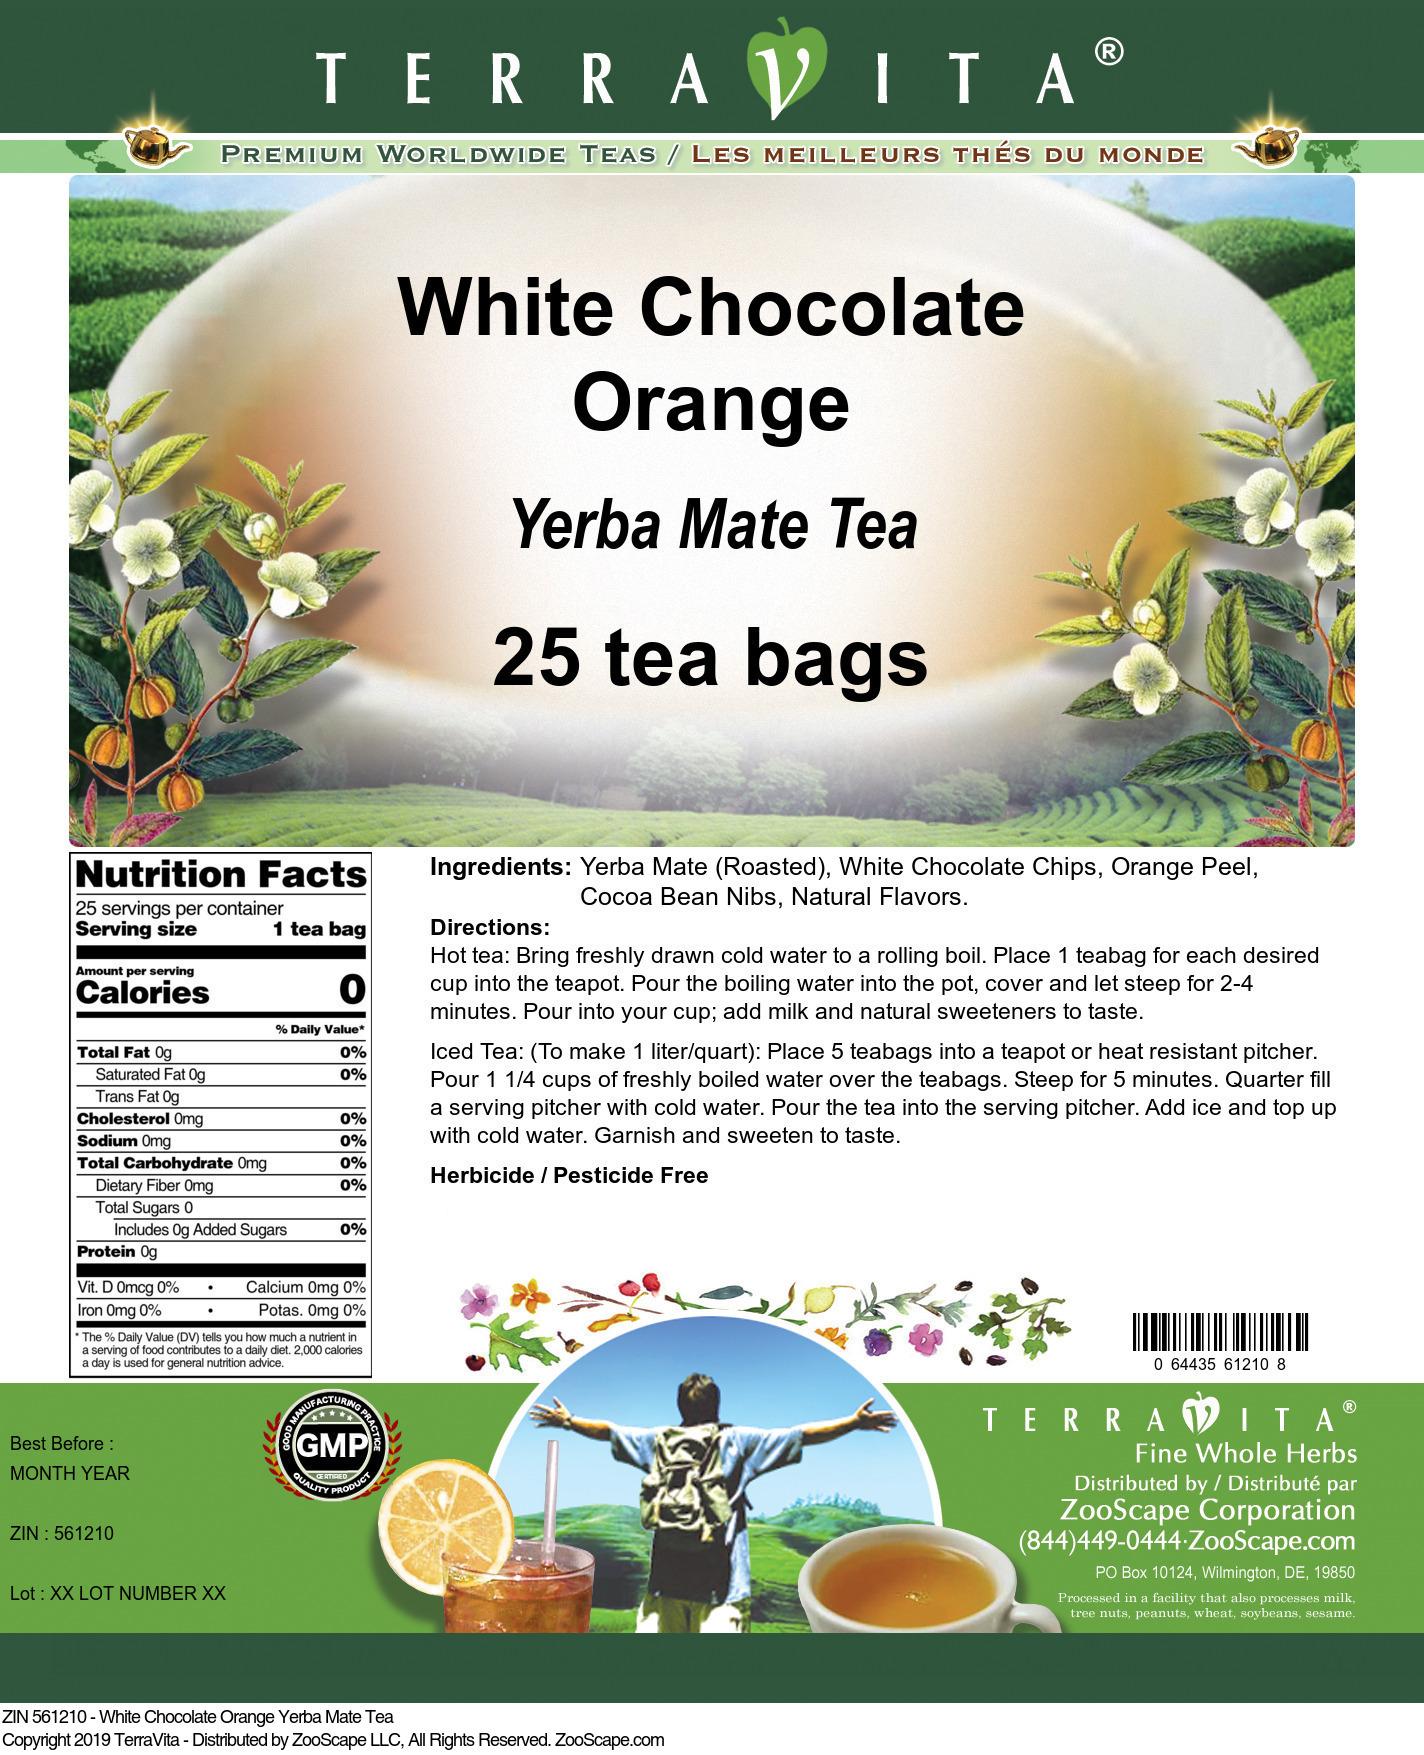 White Chocolate Orange Yerba Mate Tea